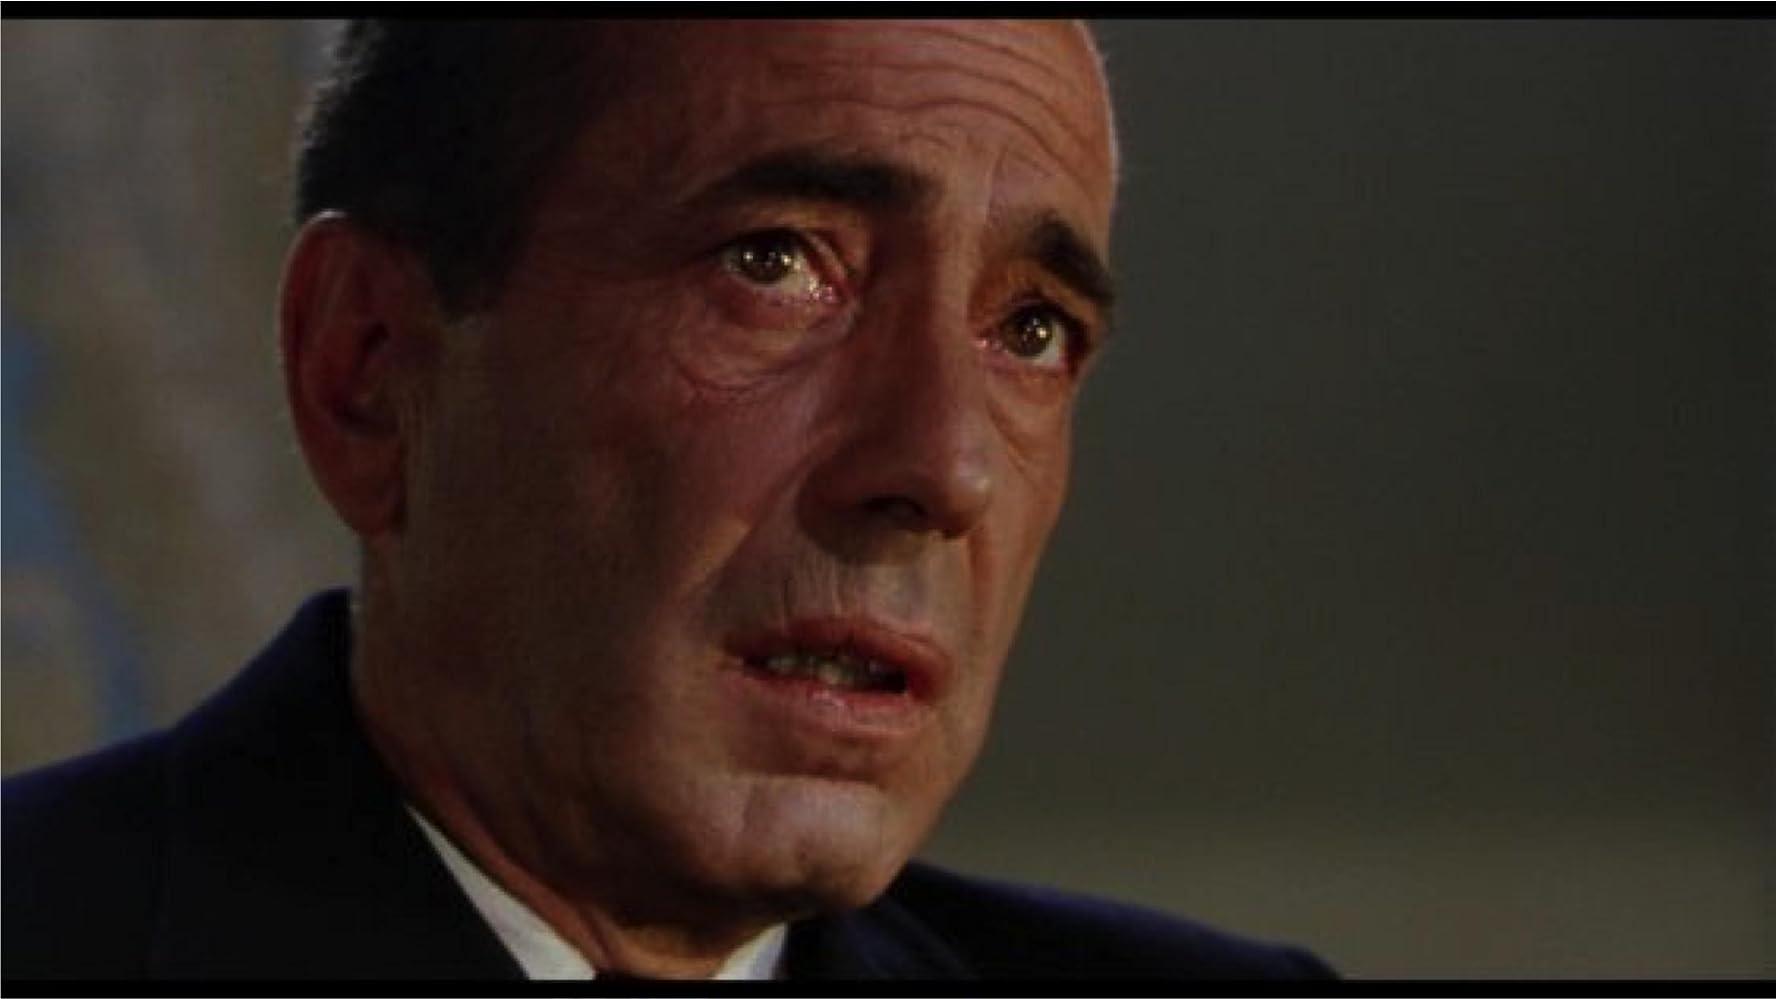 Humphrey Bogart in The Caine Mutiny 1954